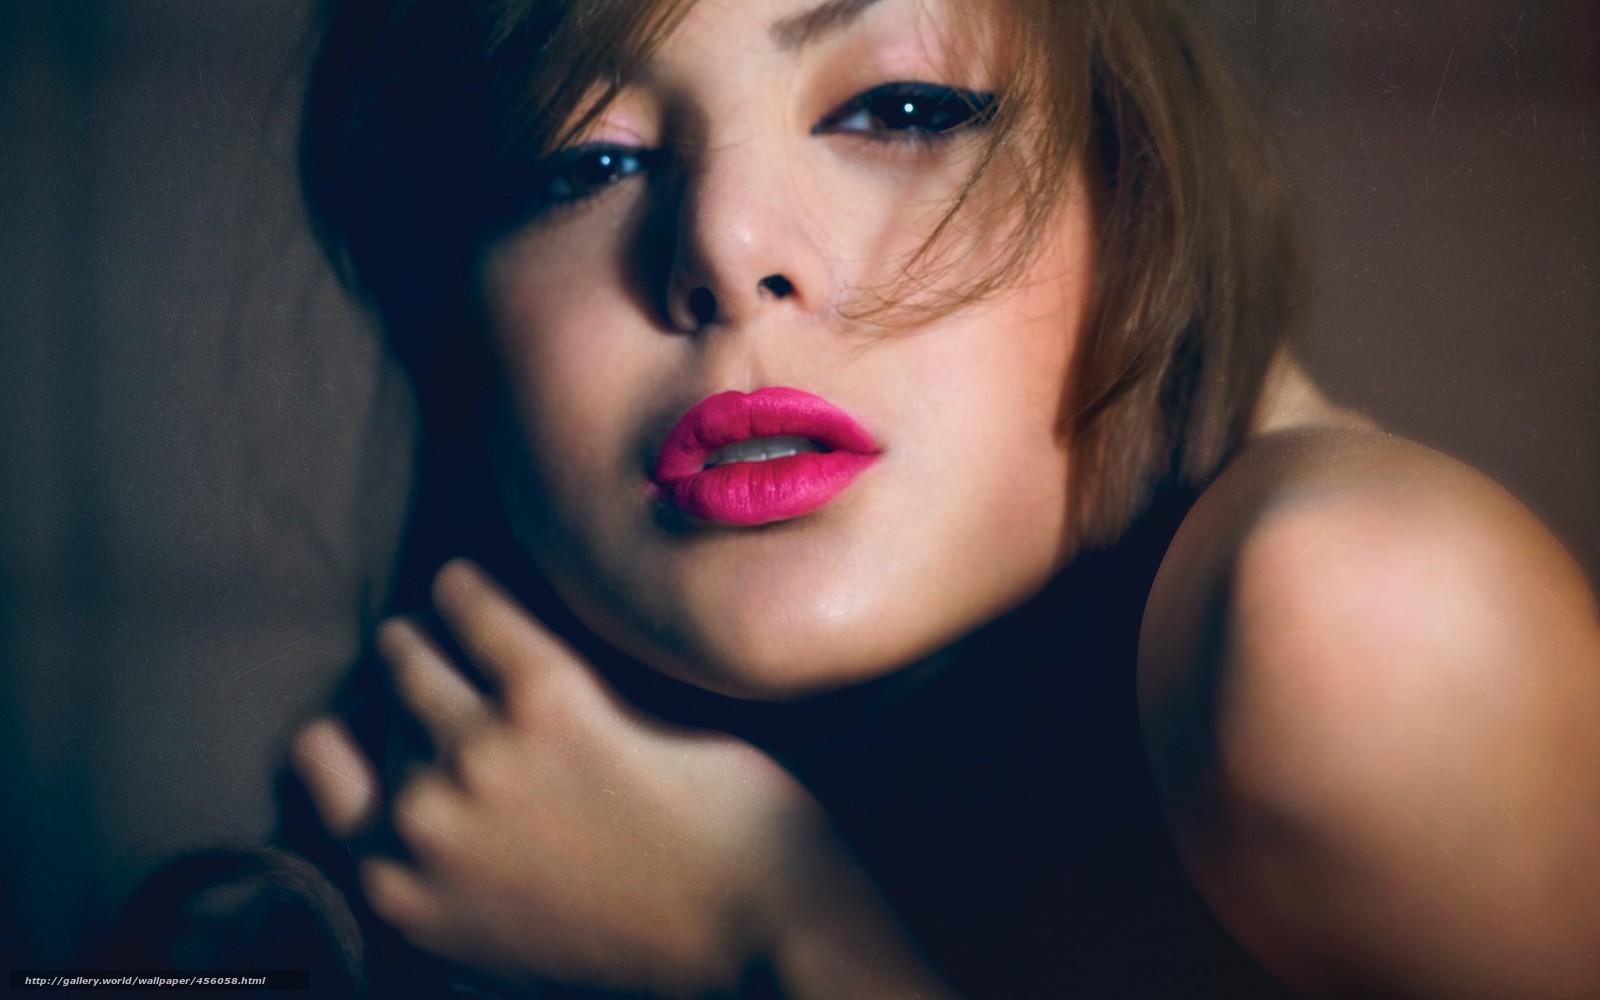 Фото брюнетка красит губы 16 фотография